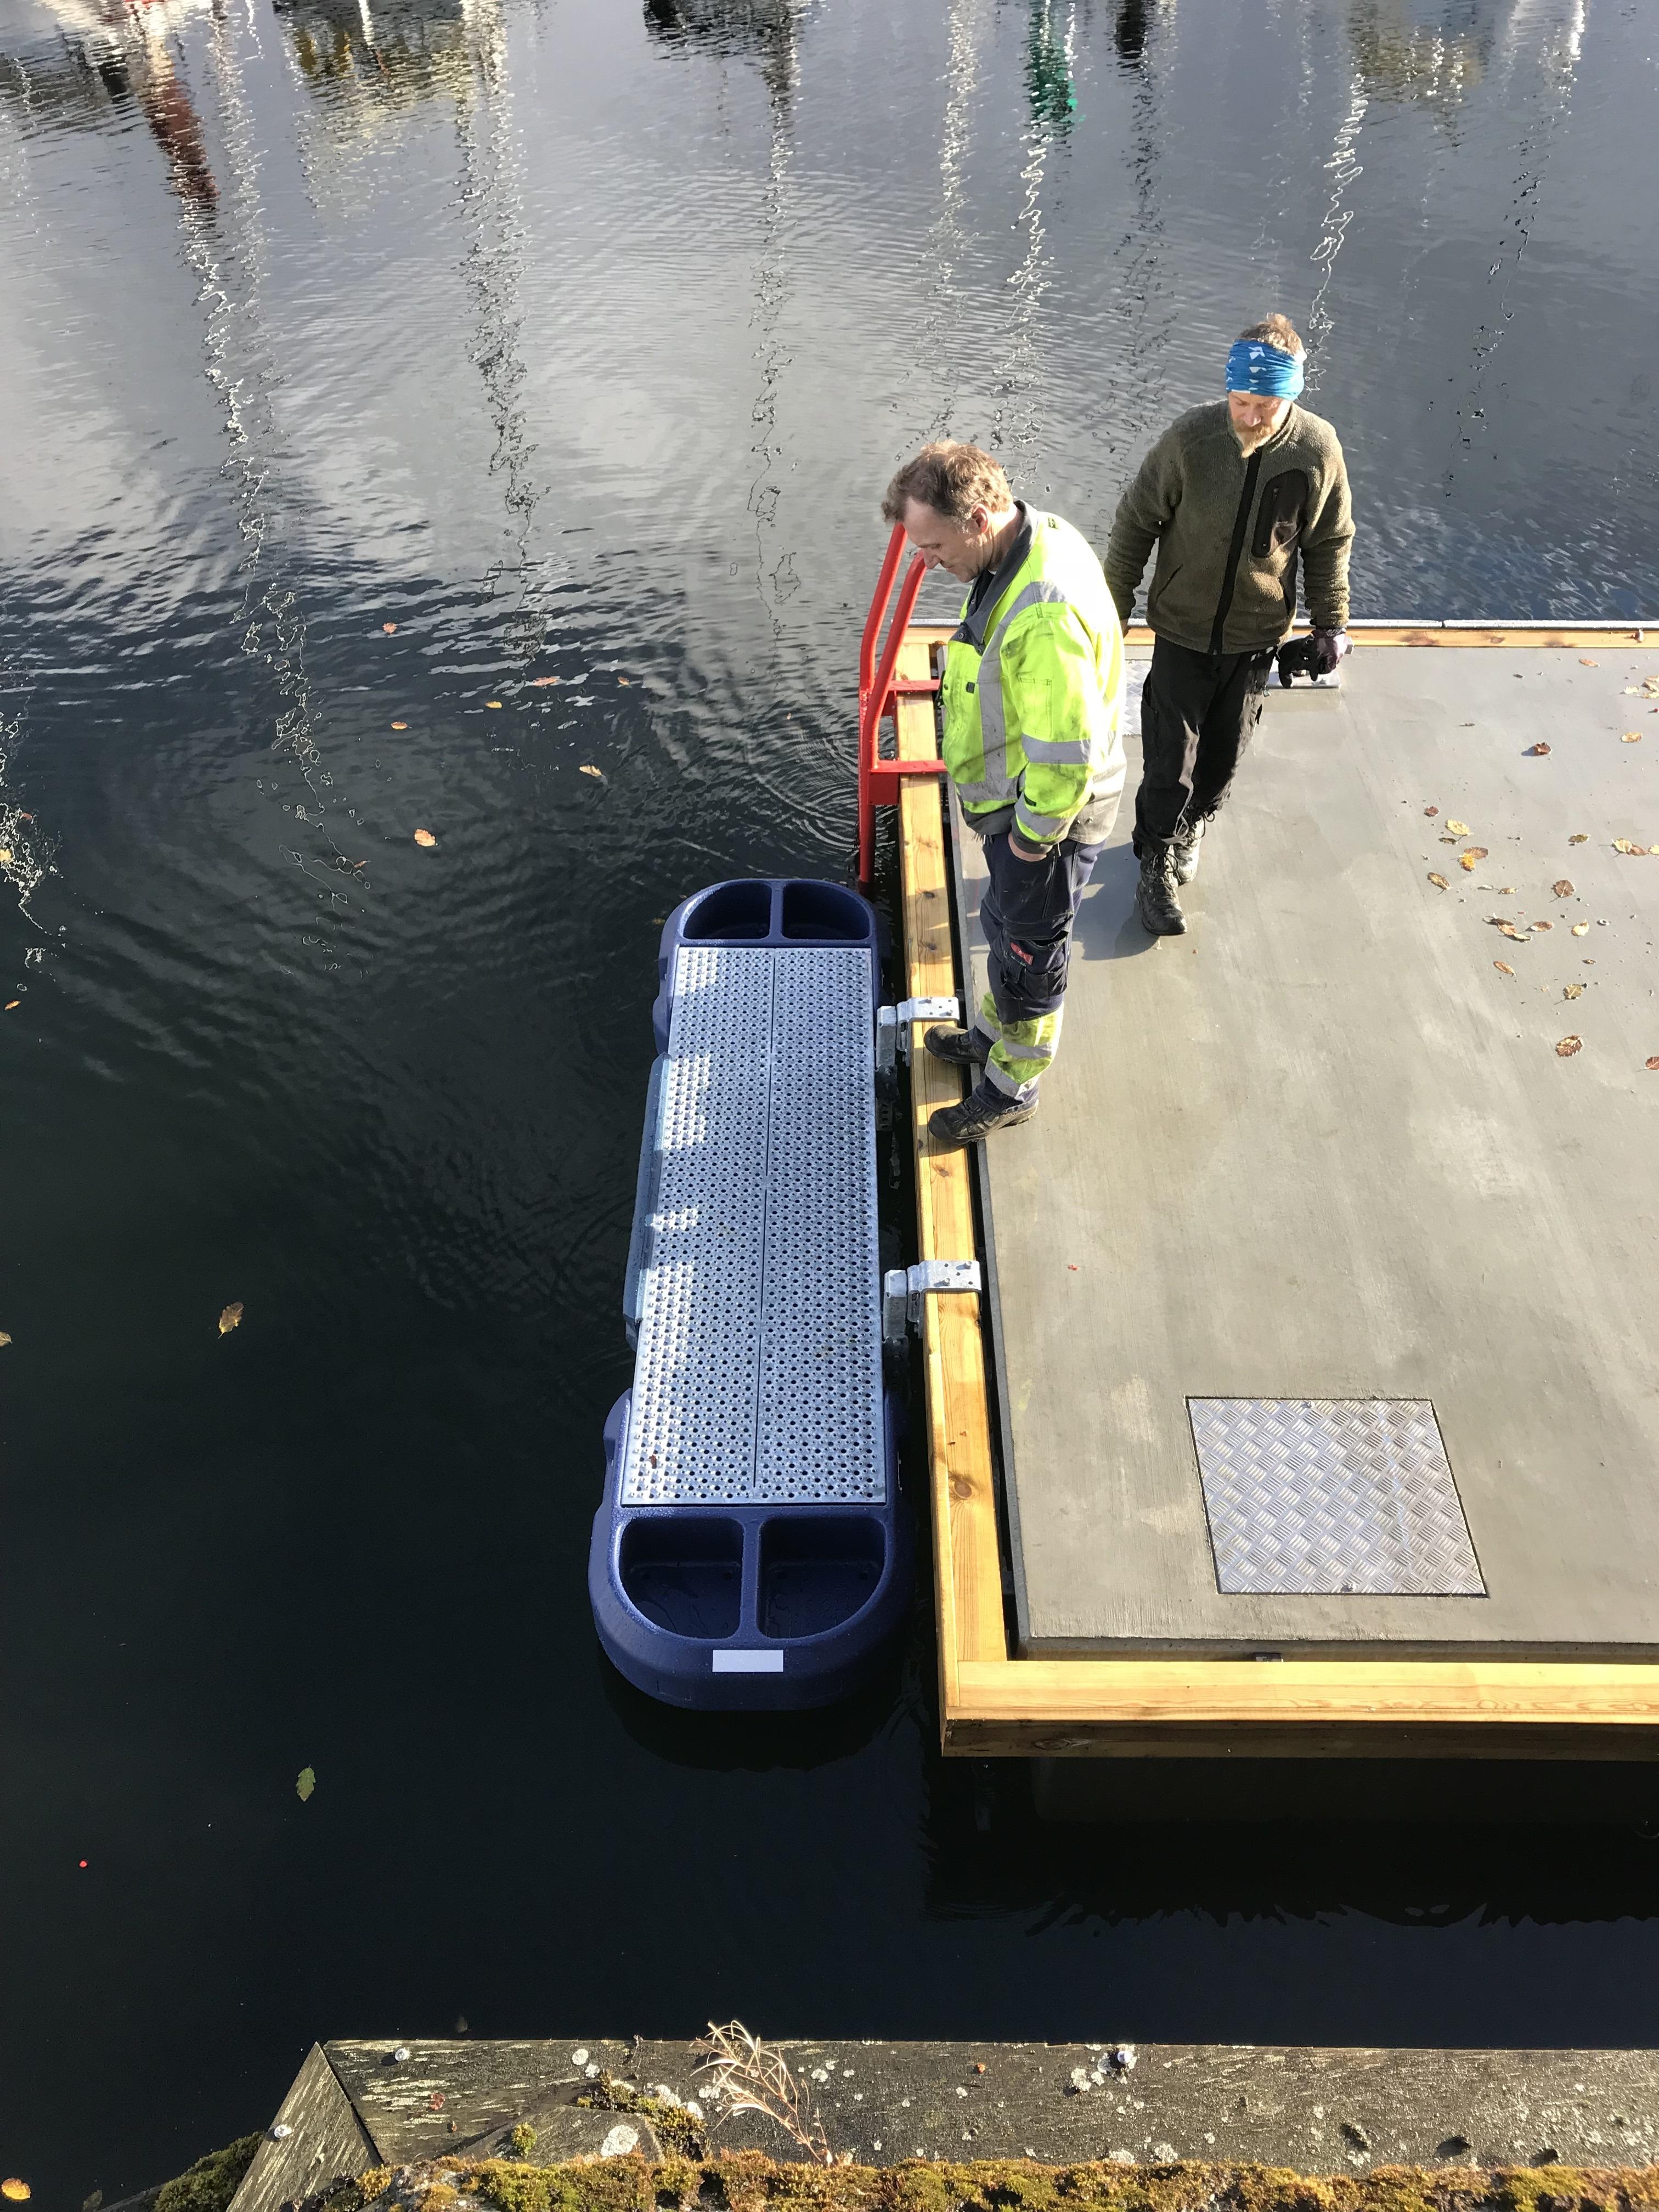 https://www.marinasolutions.no/uploads/kajakkplattform-Trondheim-havn-redningsleider.jpg